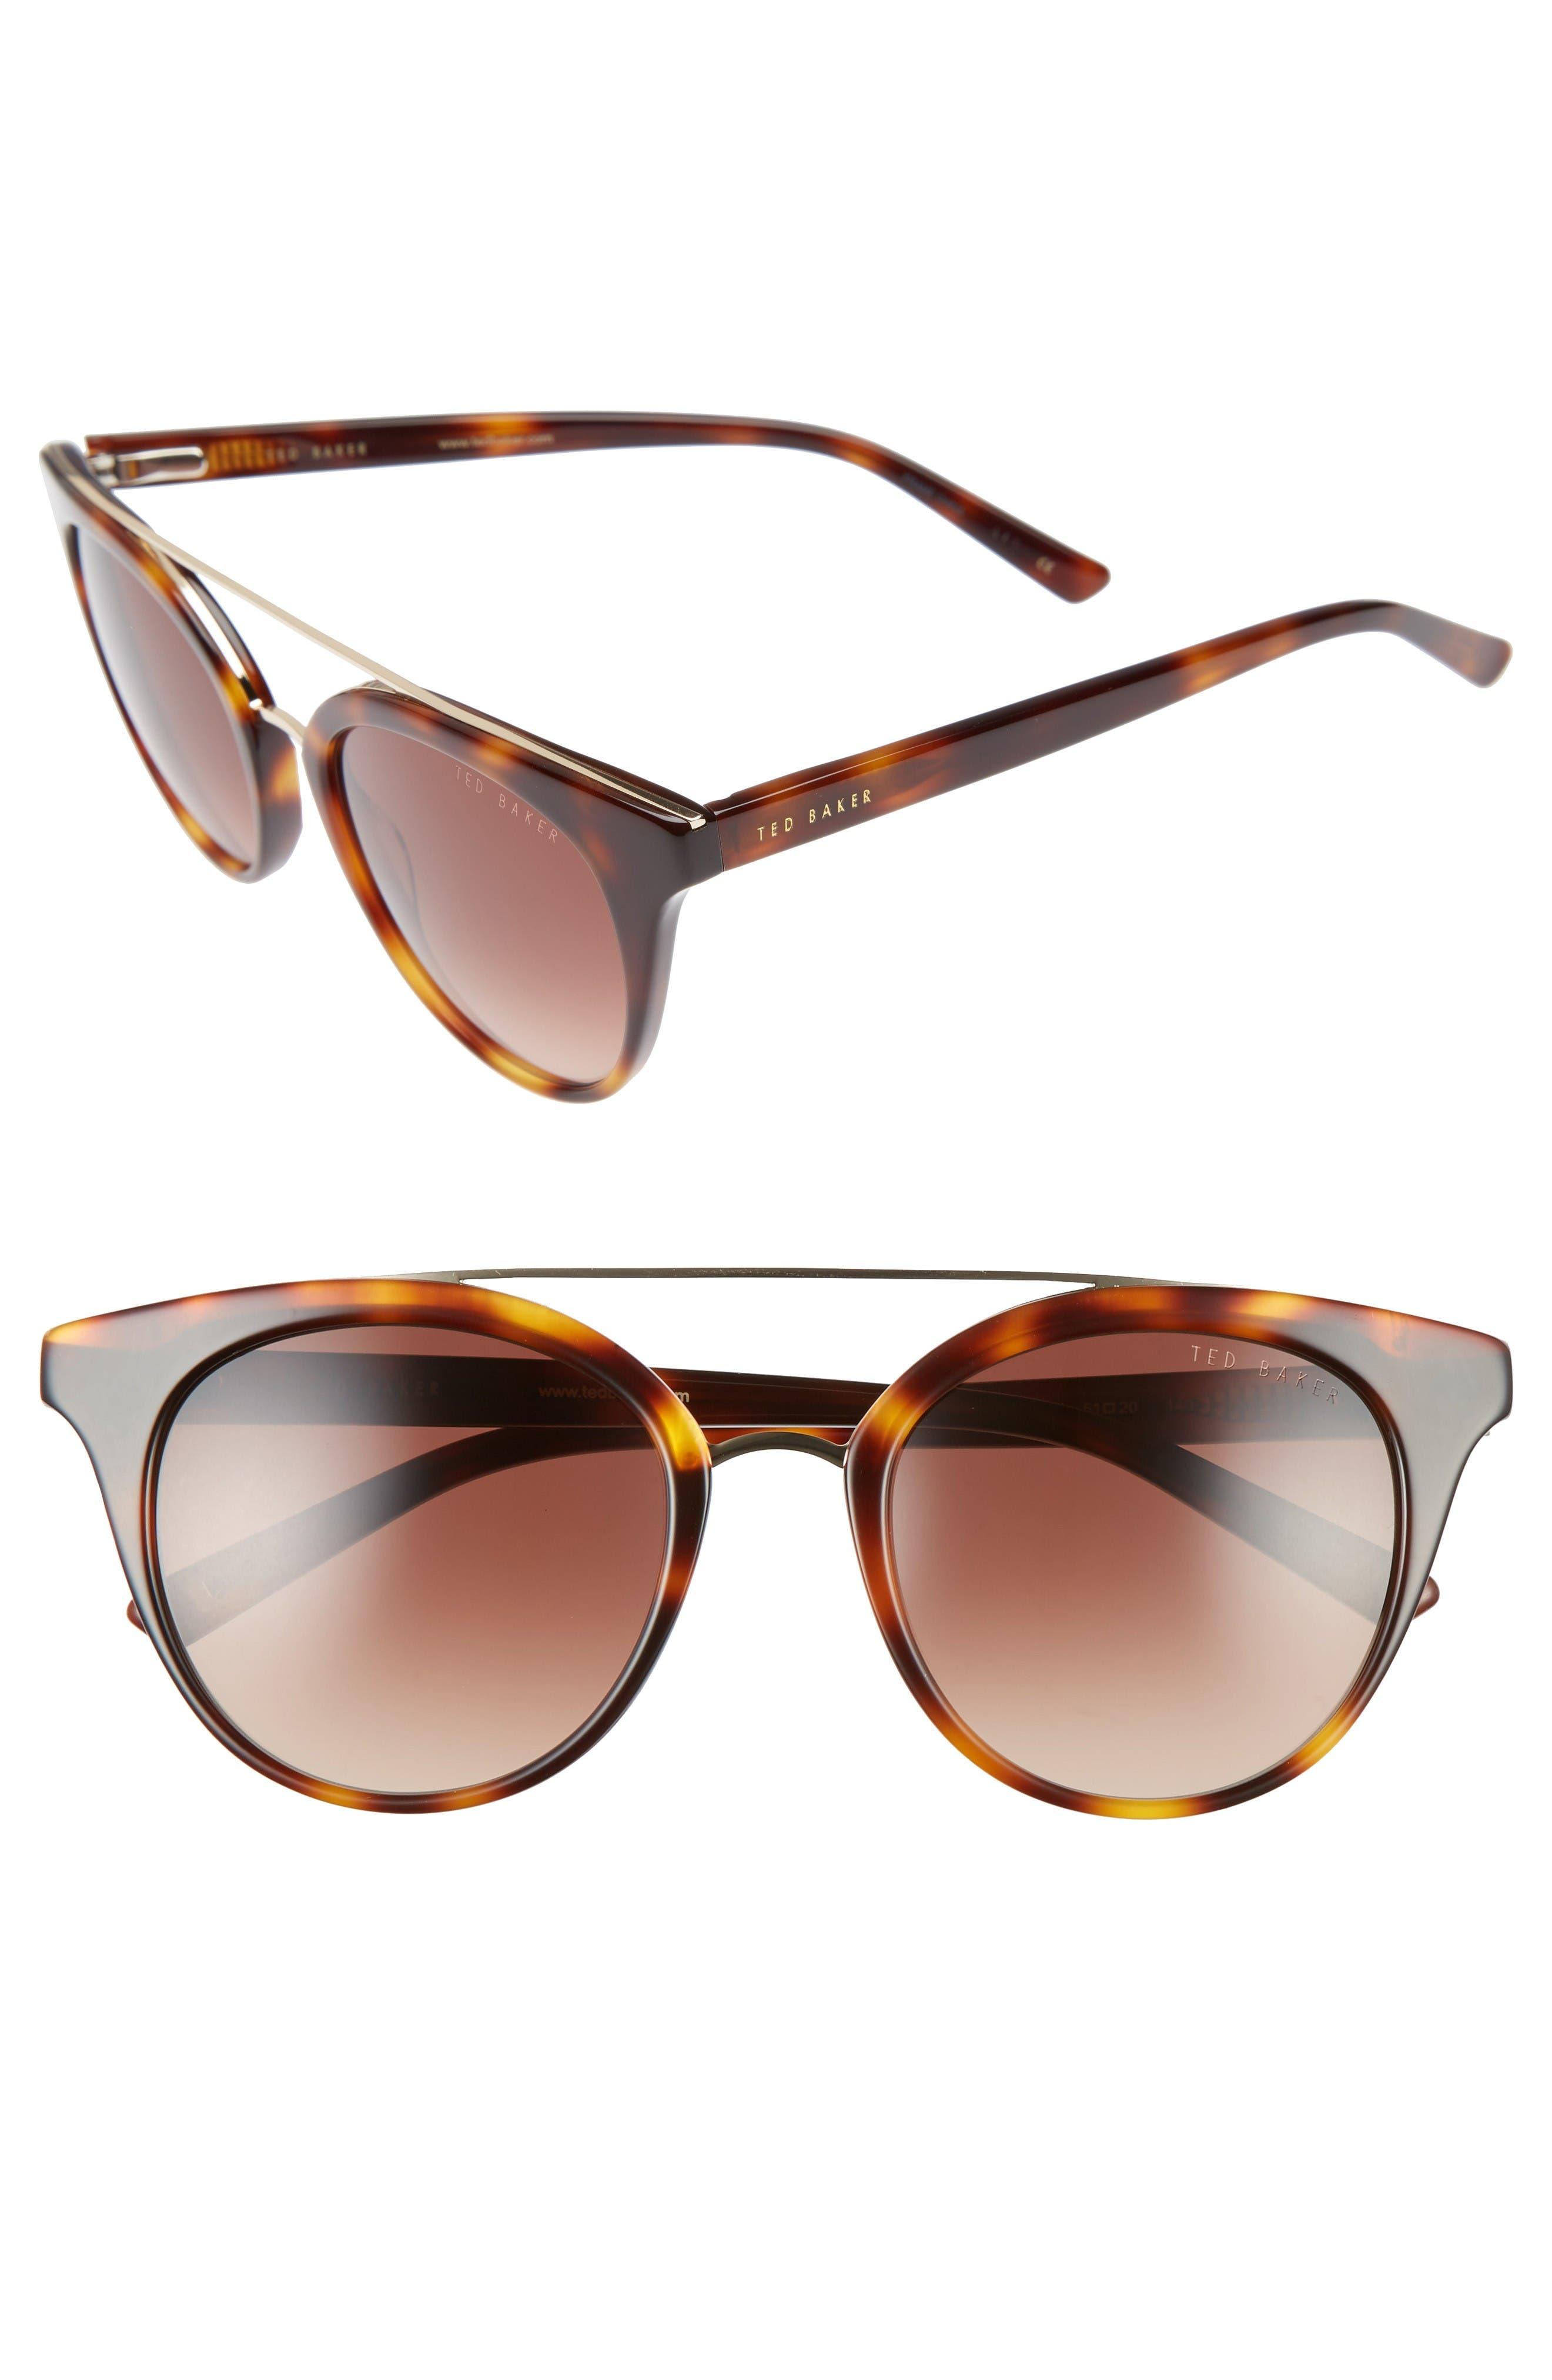 Main Image - Ted Baker London 51mm Gradient Lens Round Retro Sunglasses